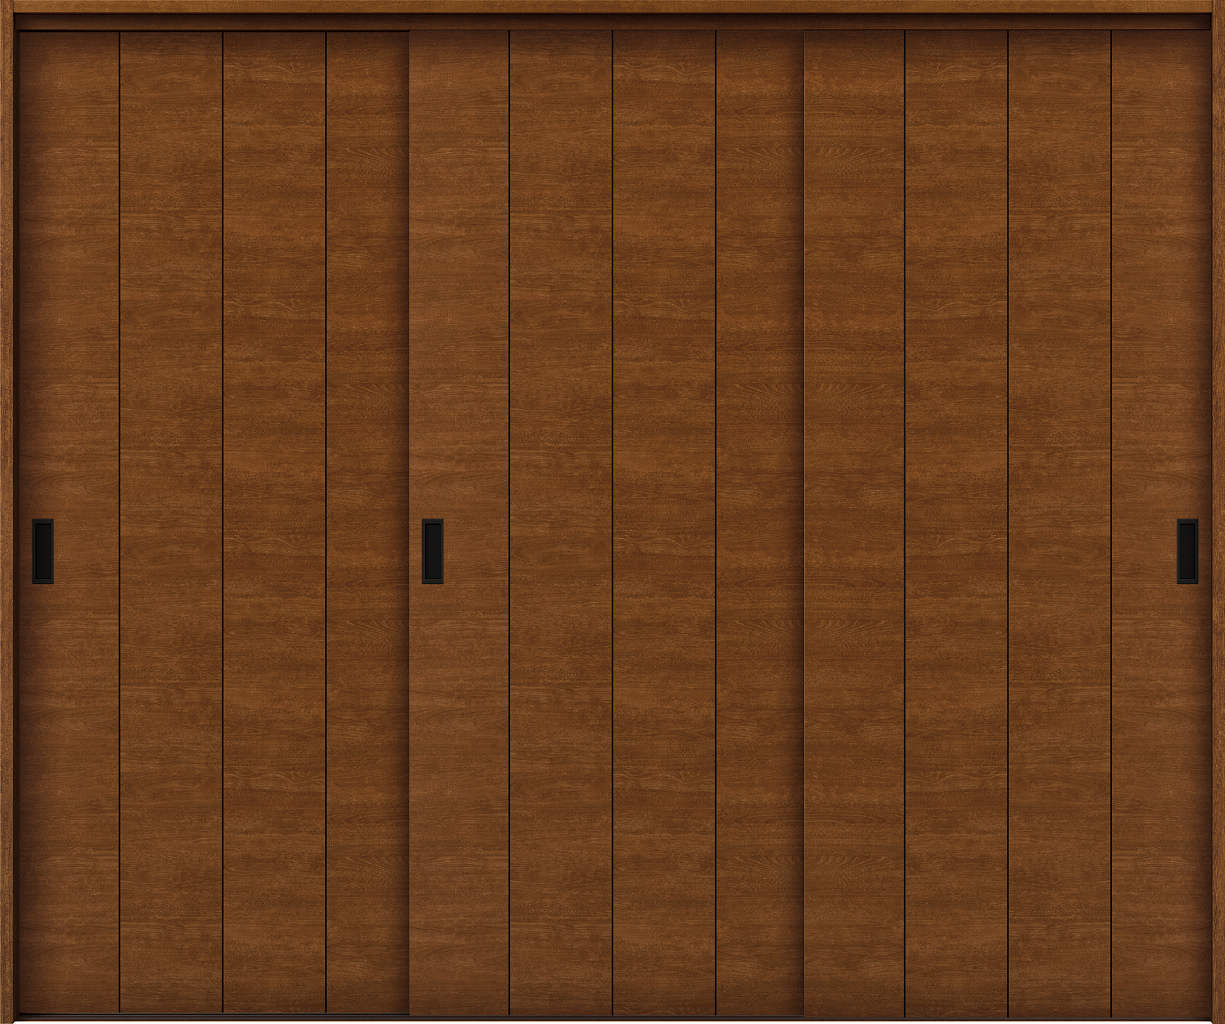 YKKAP室内引戸 ラフォレスタ[スタイリッシュ][木目横] 3枚引き違い戸 Y11 ケーシング枠:[幅2433mm×高2033mm]